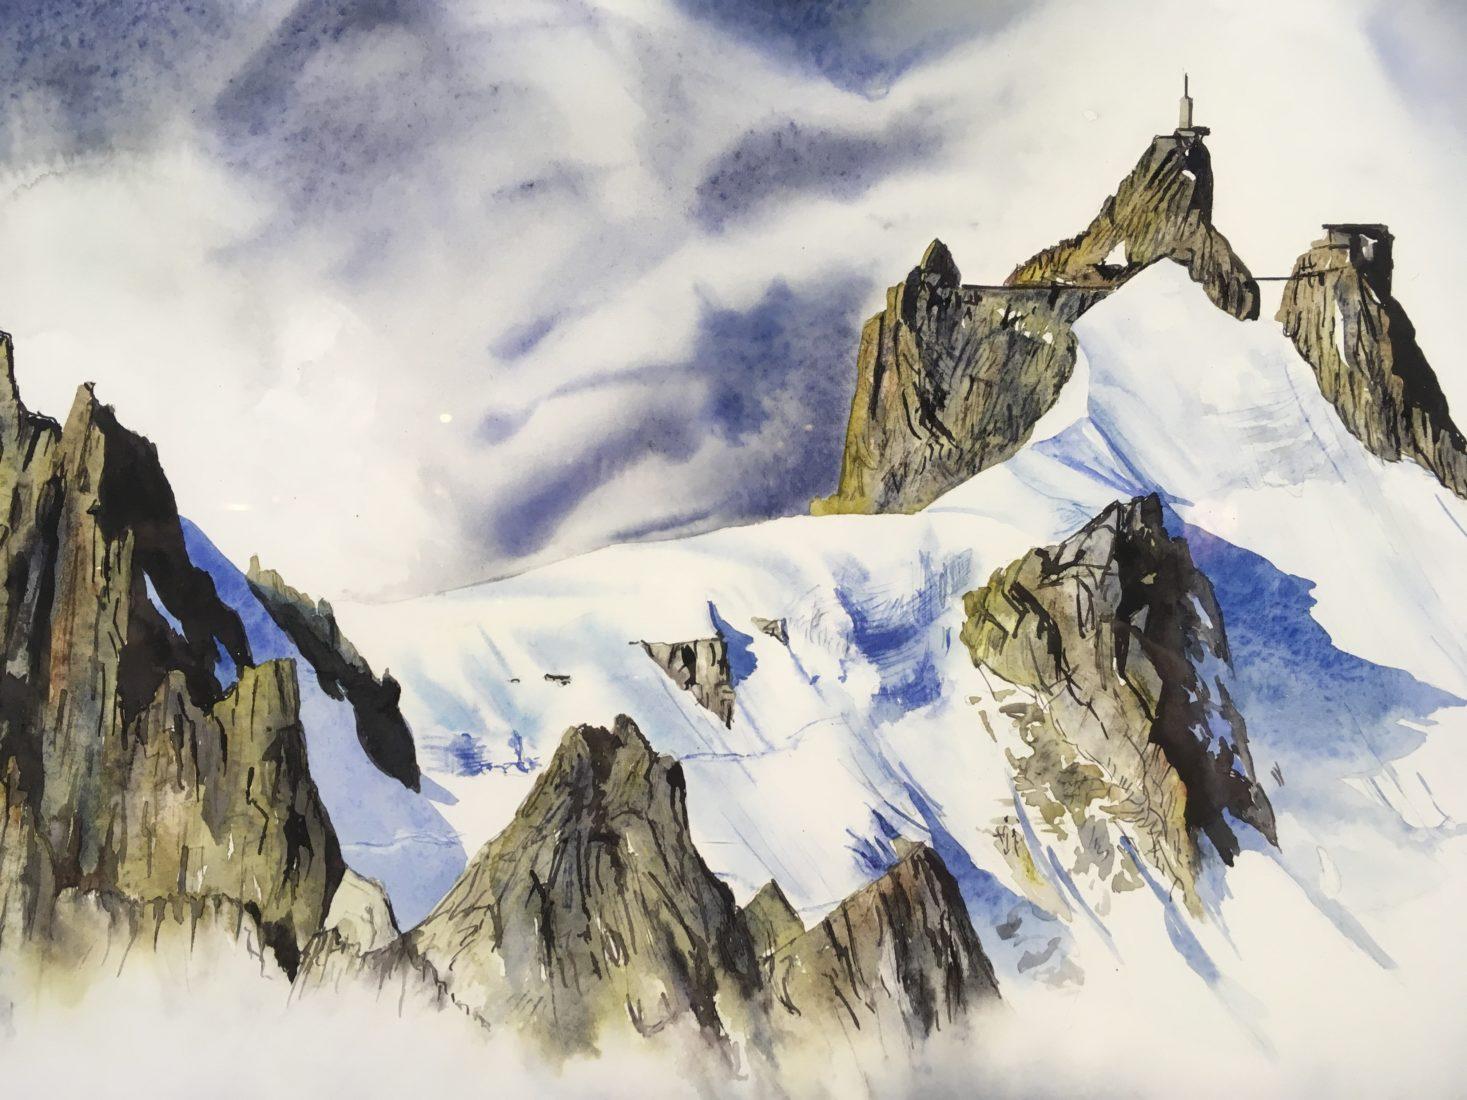 Guy Tournier Chamonix Aiguille du Midi